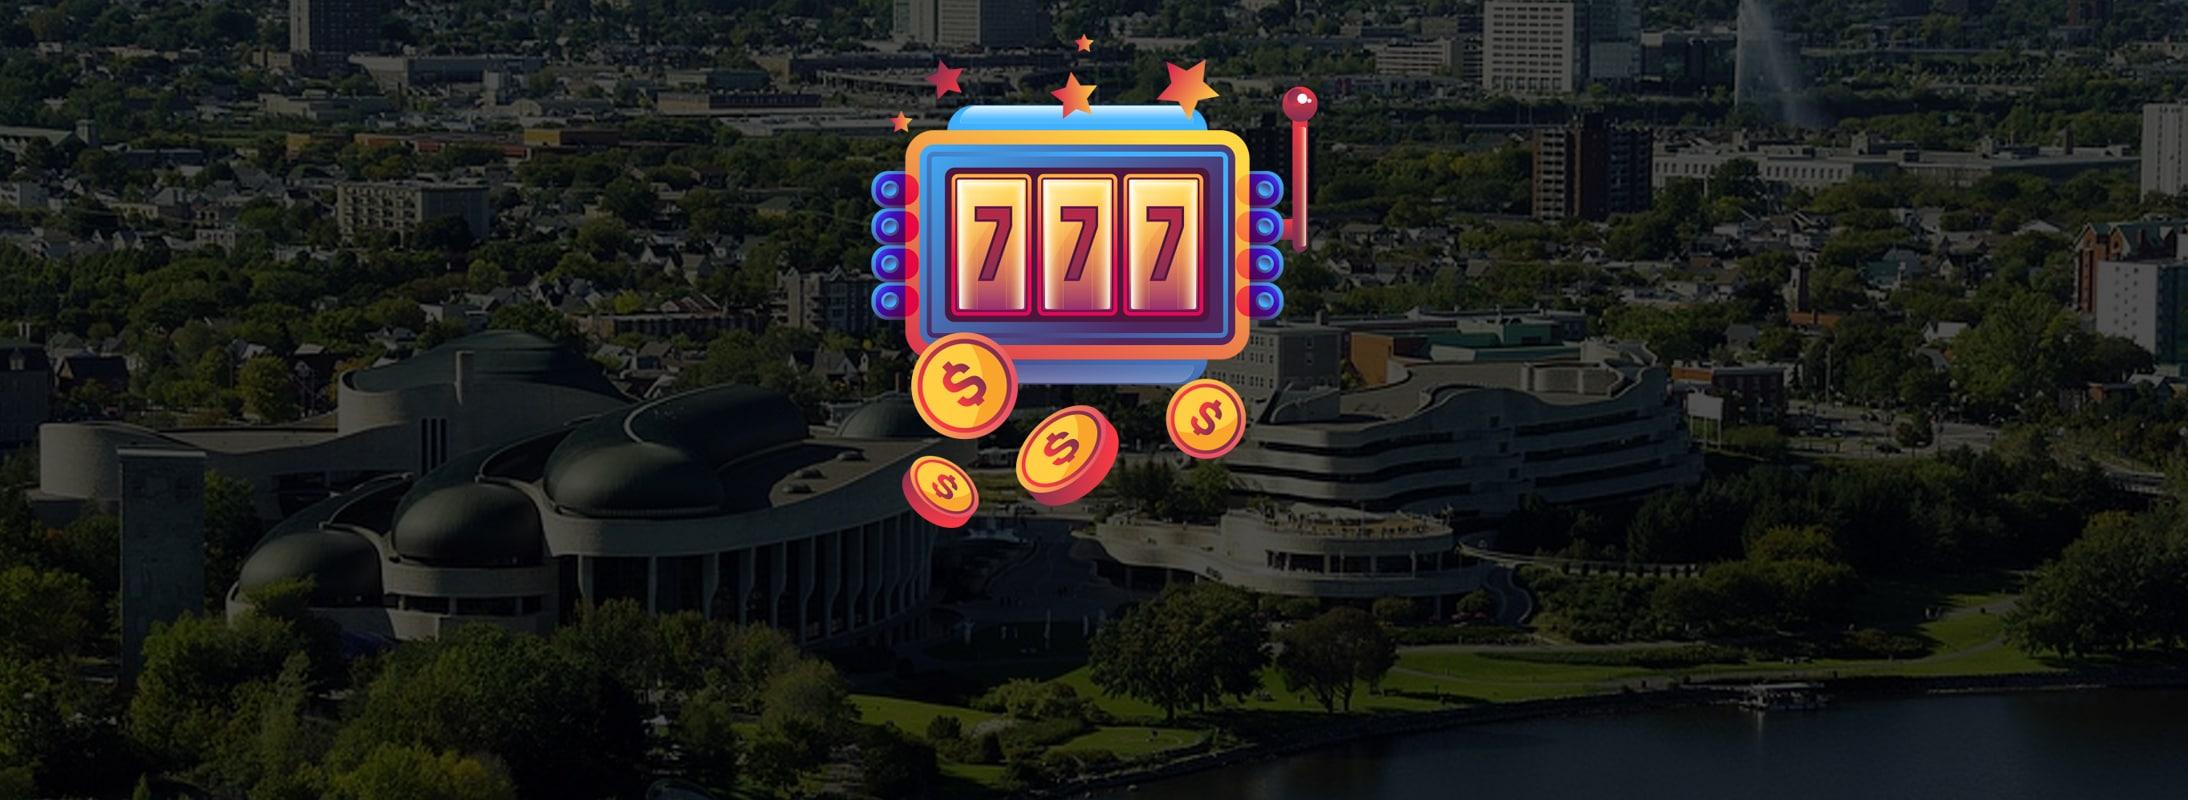 Ottawa Online Casino & Gambling Guide - 2019